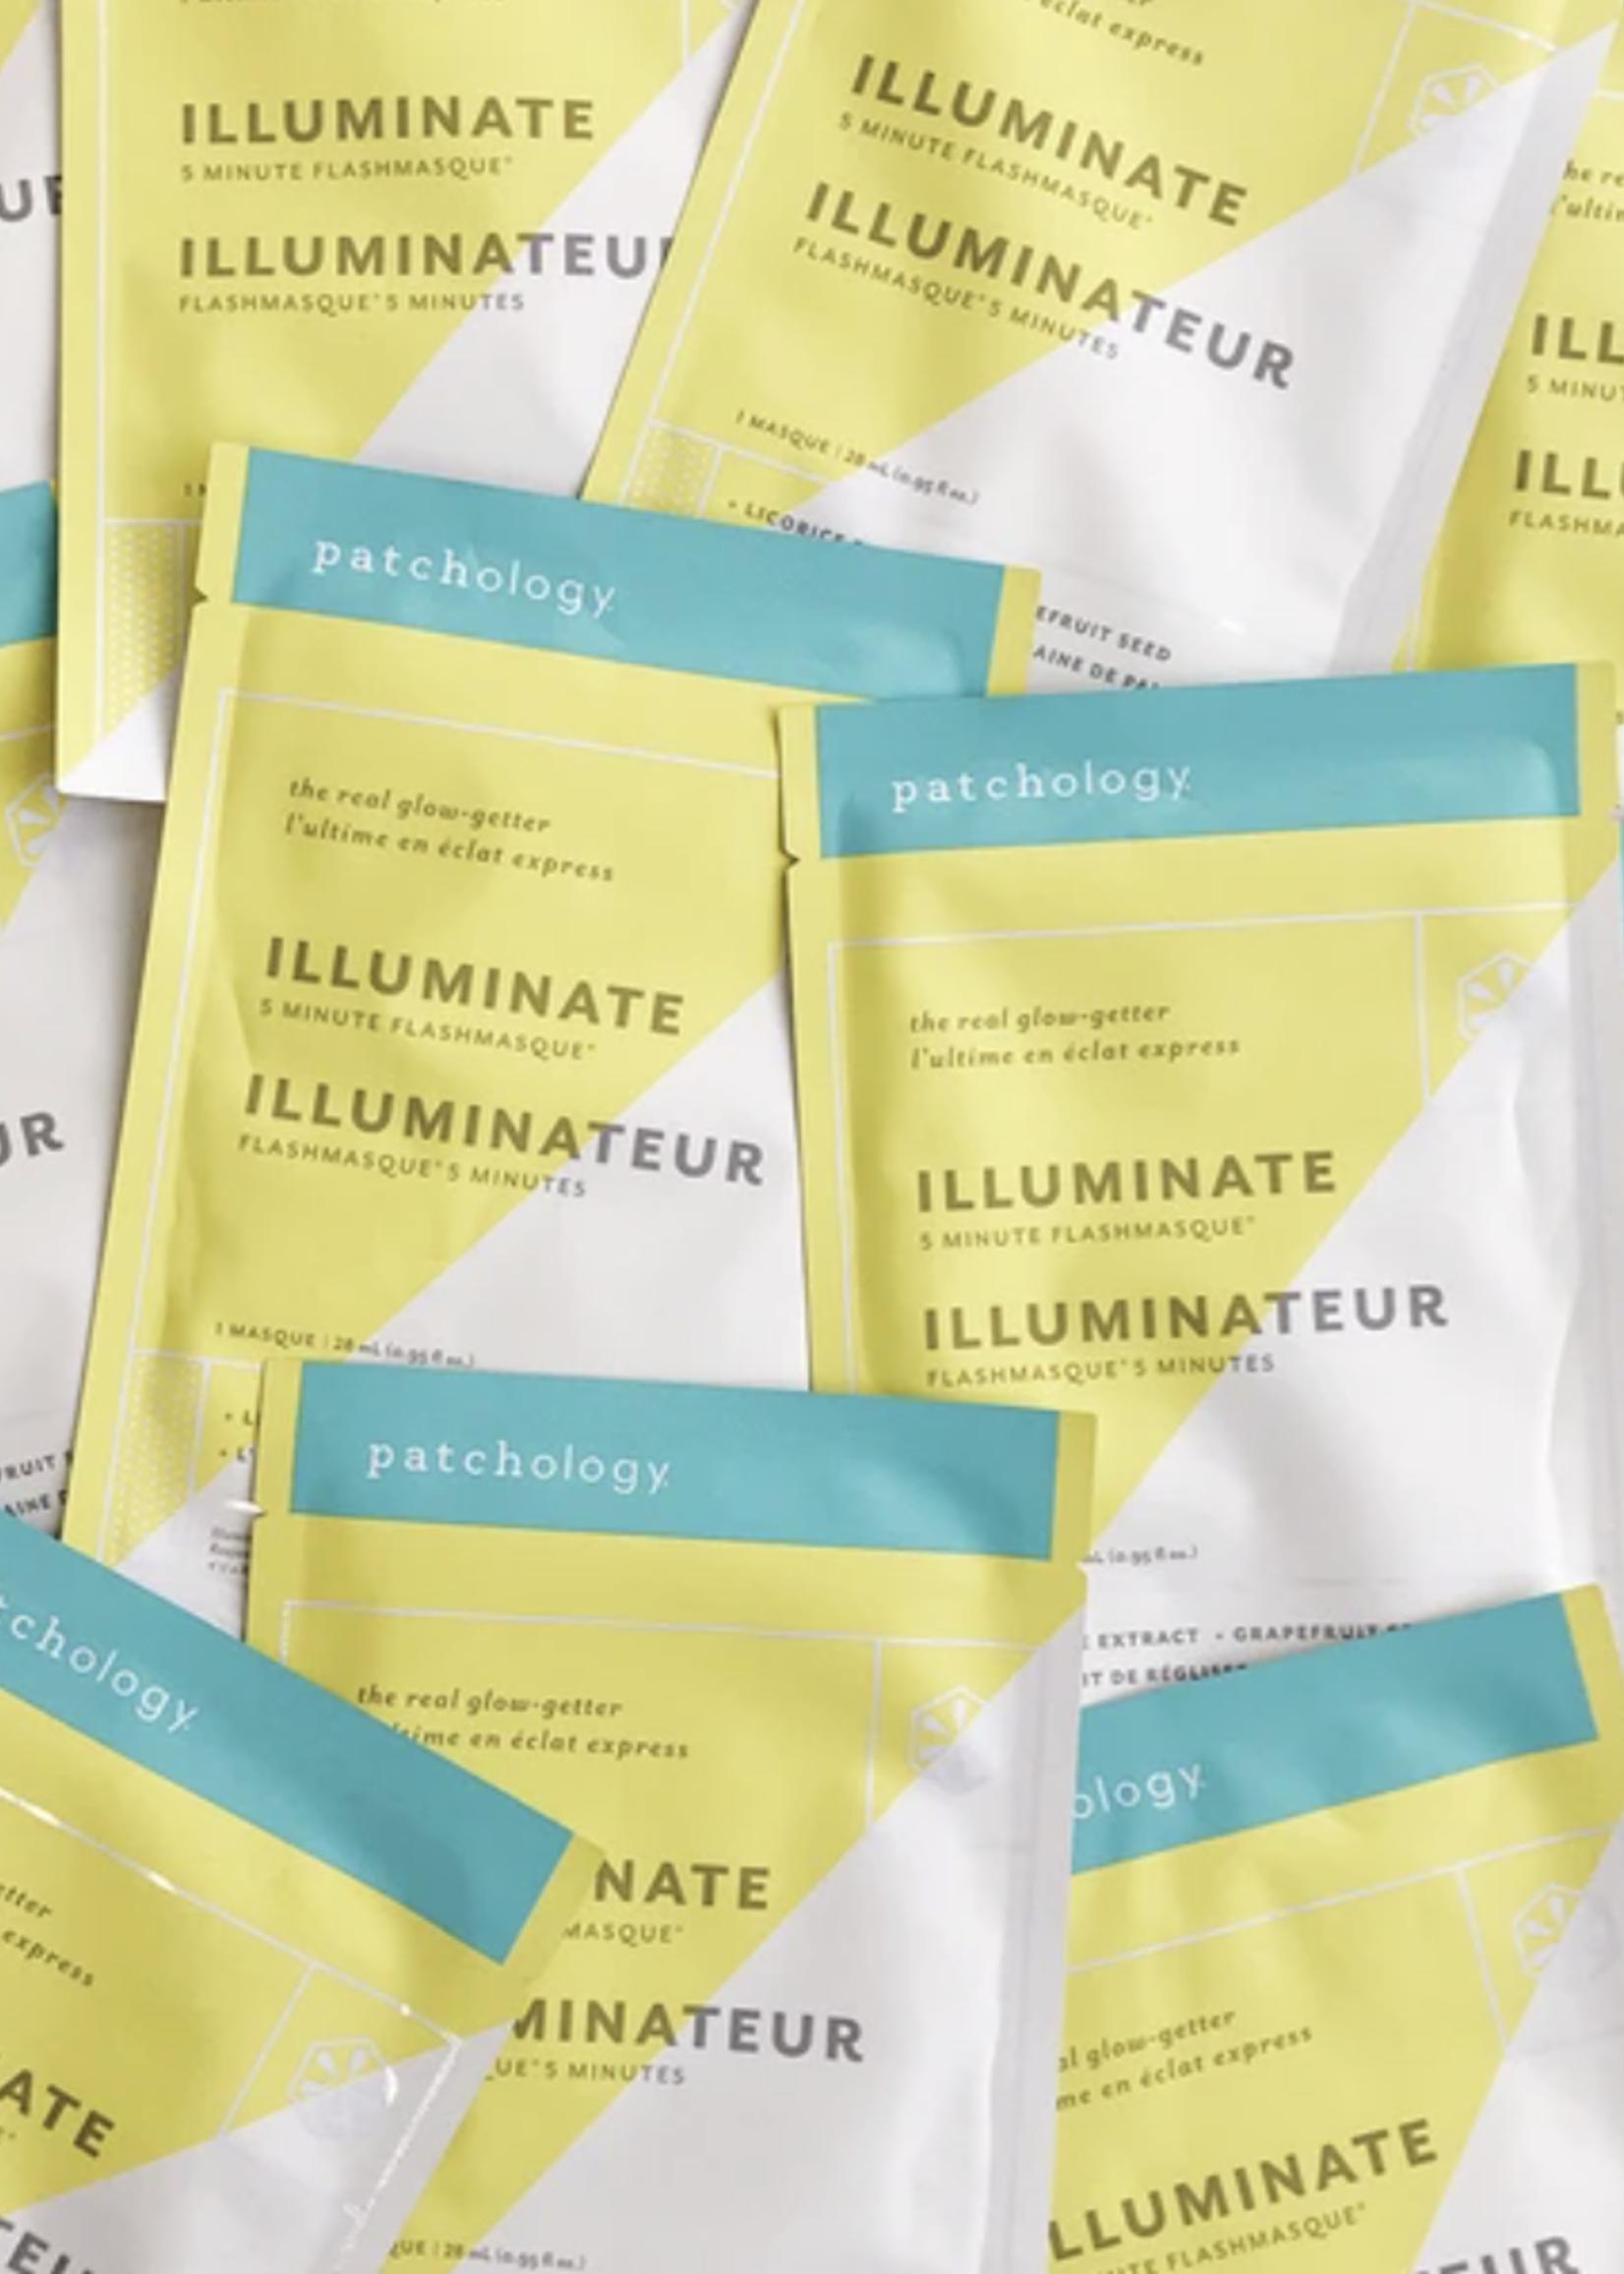 Patchology Illuminate 5-Minute Flashmasque by Patchology